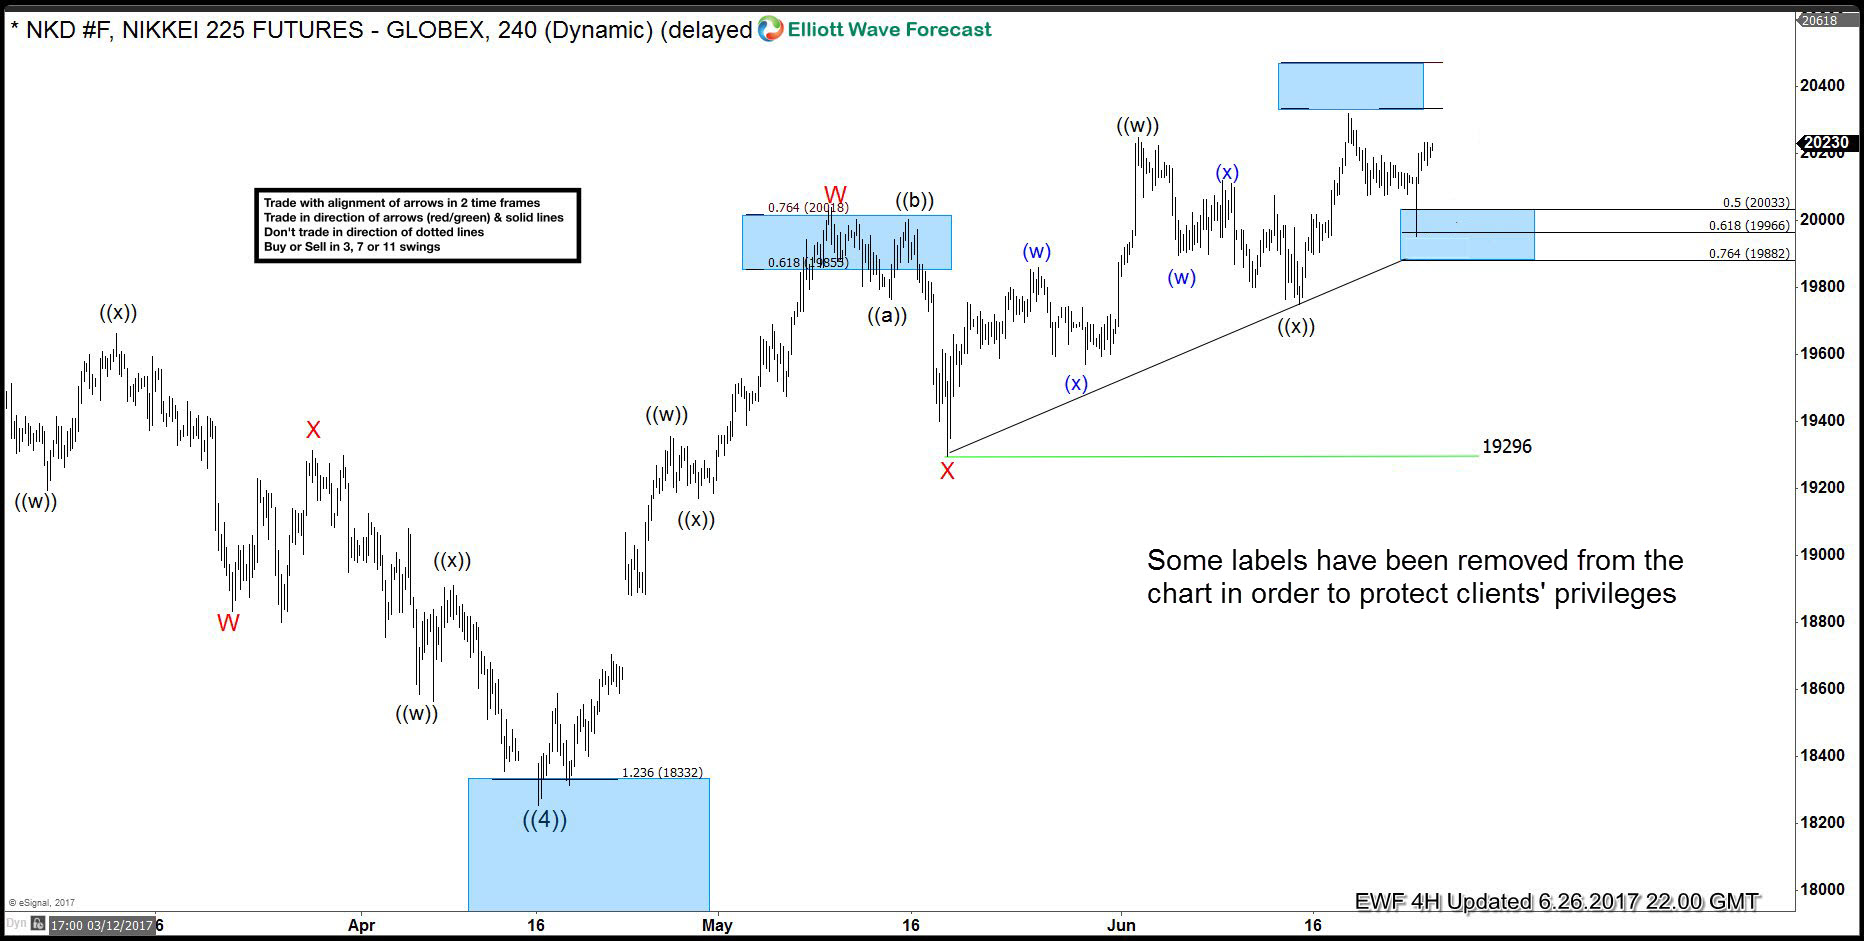 Nikkei (NKD #F) Elliott Wave 4